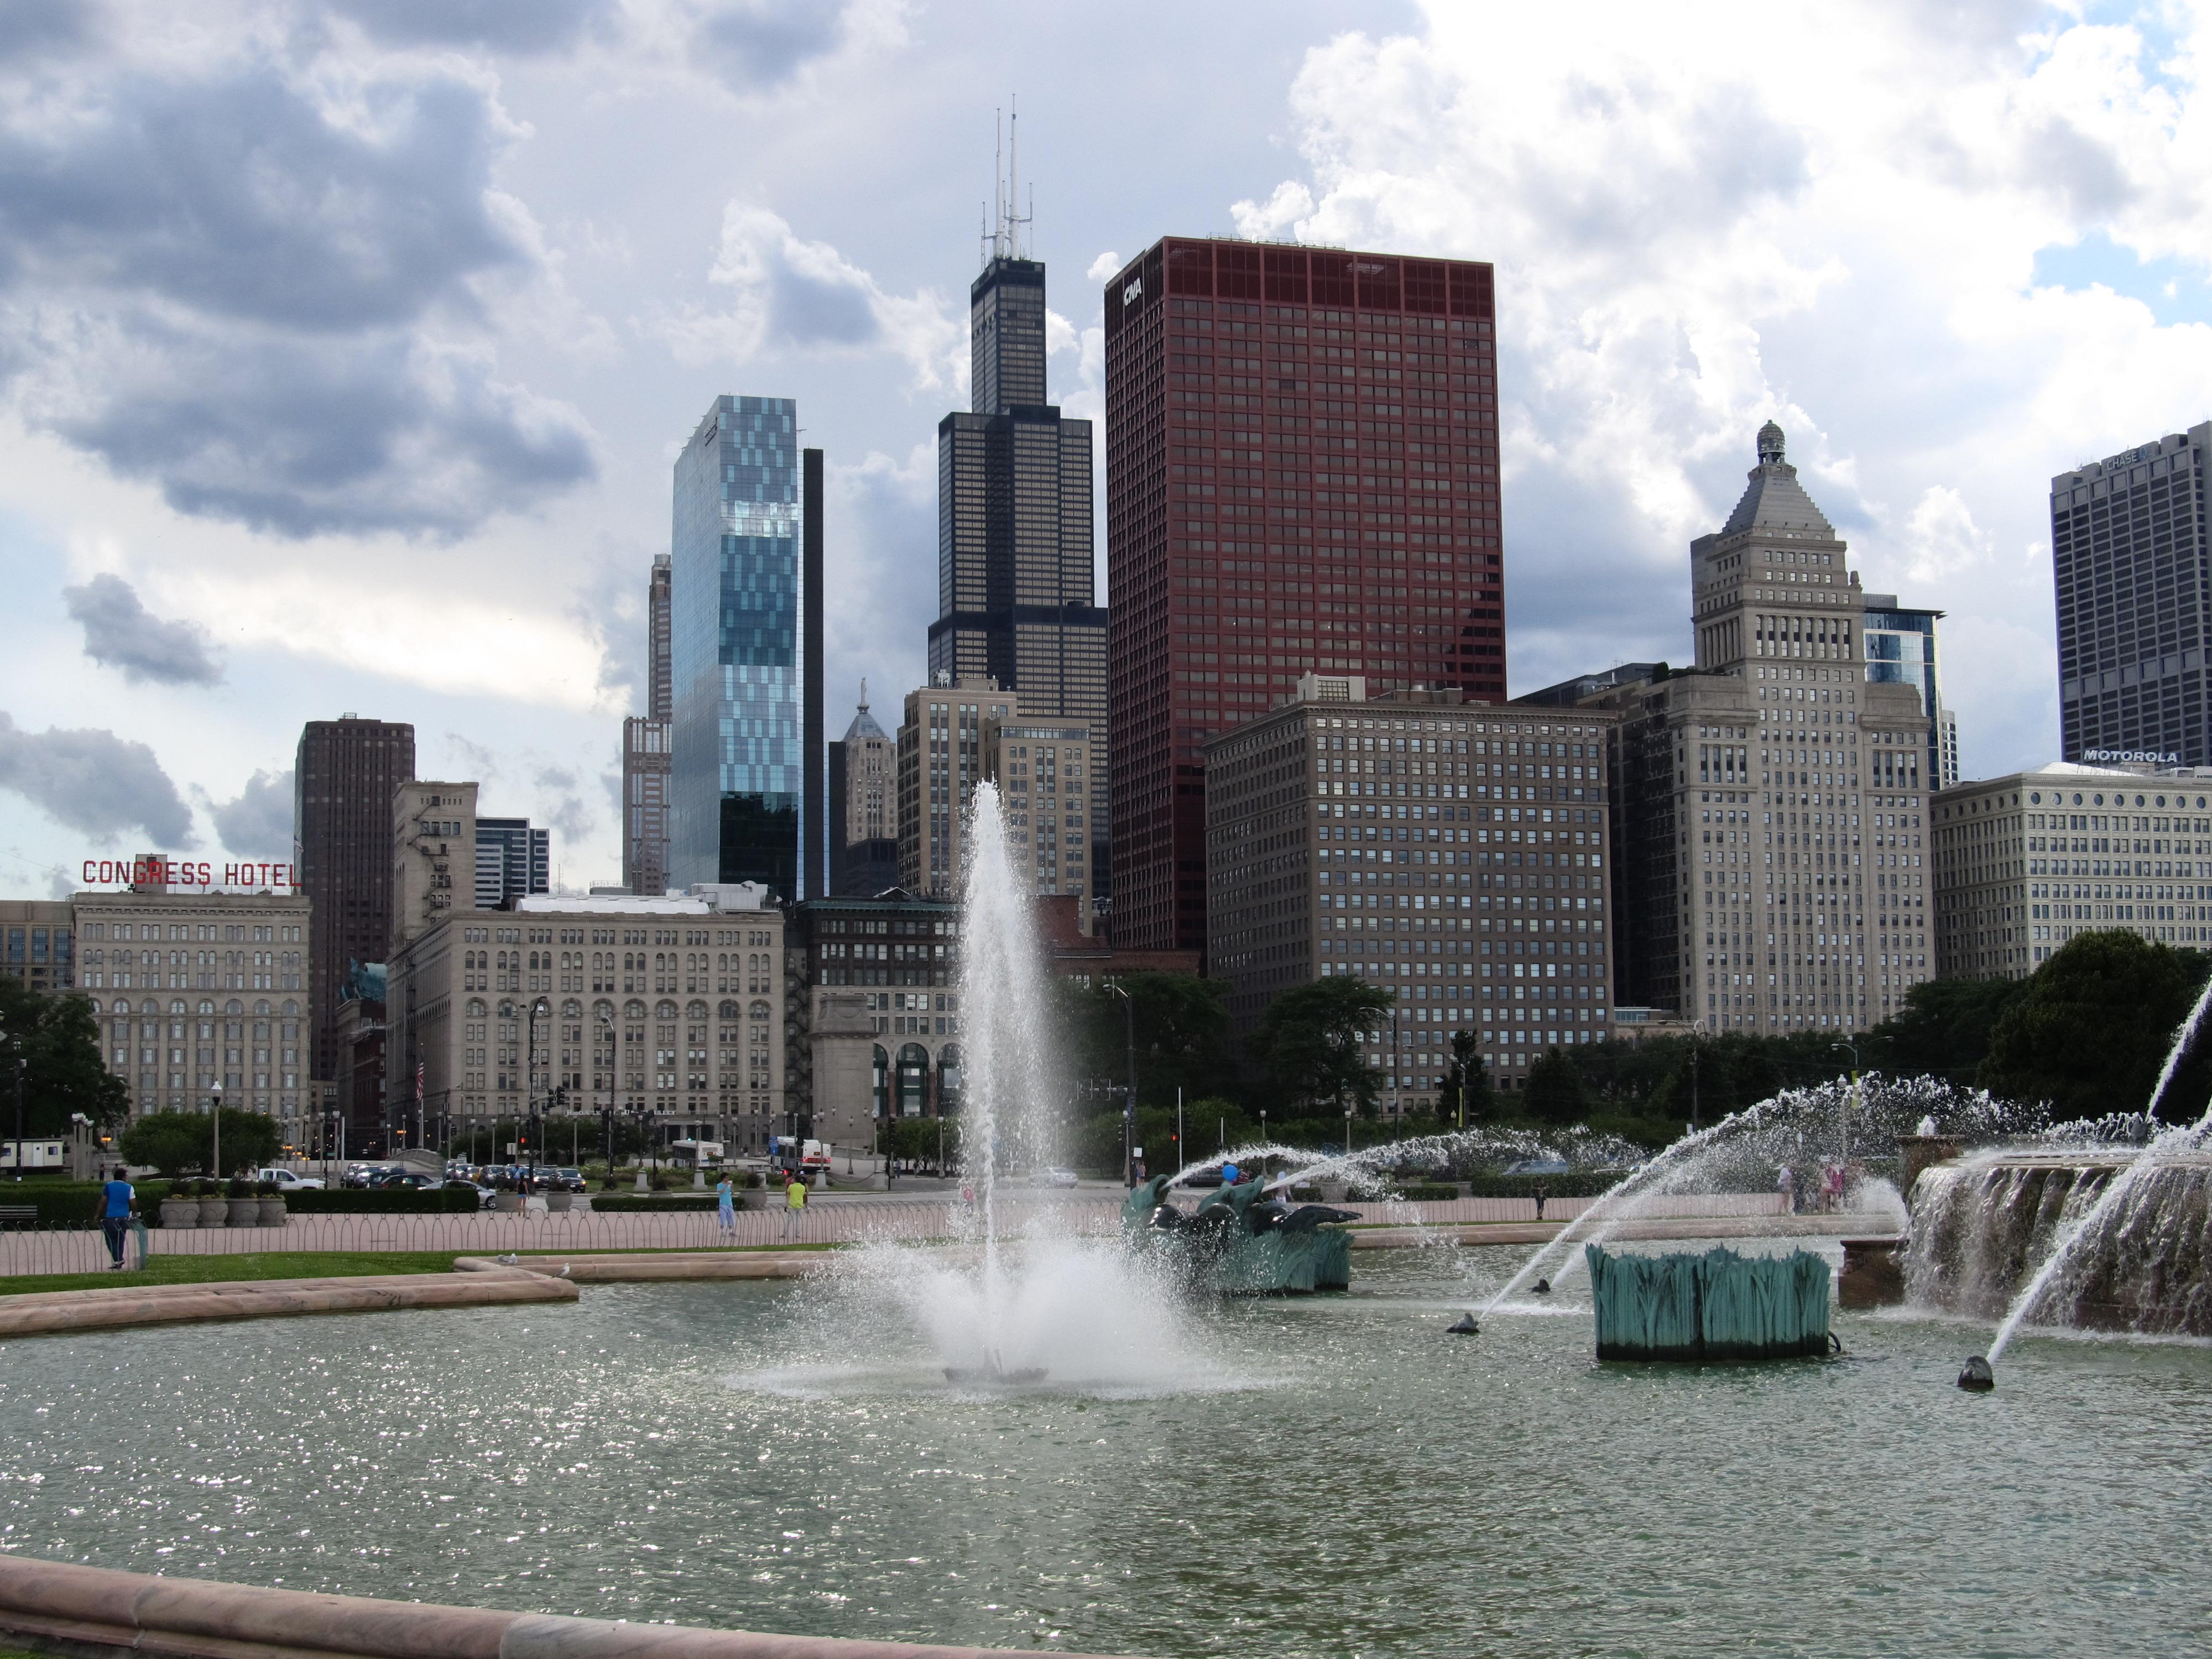 File:Buckingham Fountain, Grant Park, Chicago, Illinois (9181739434